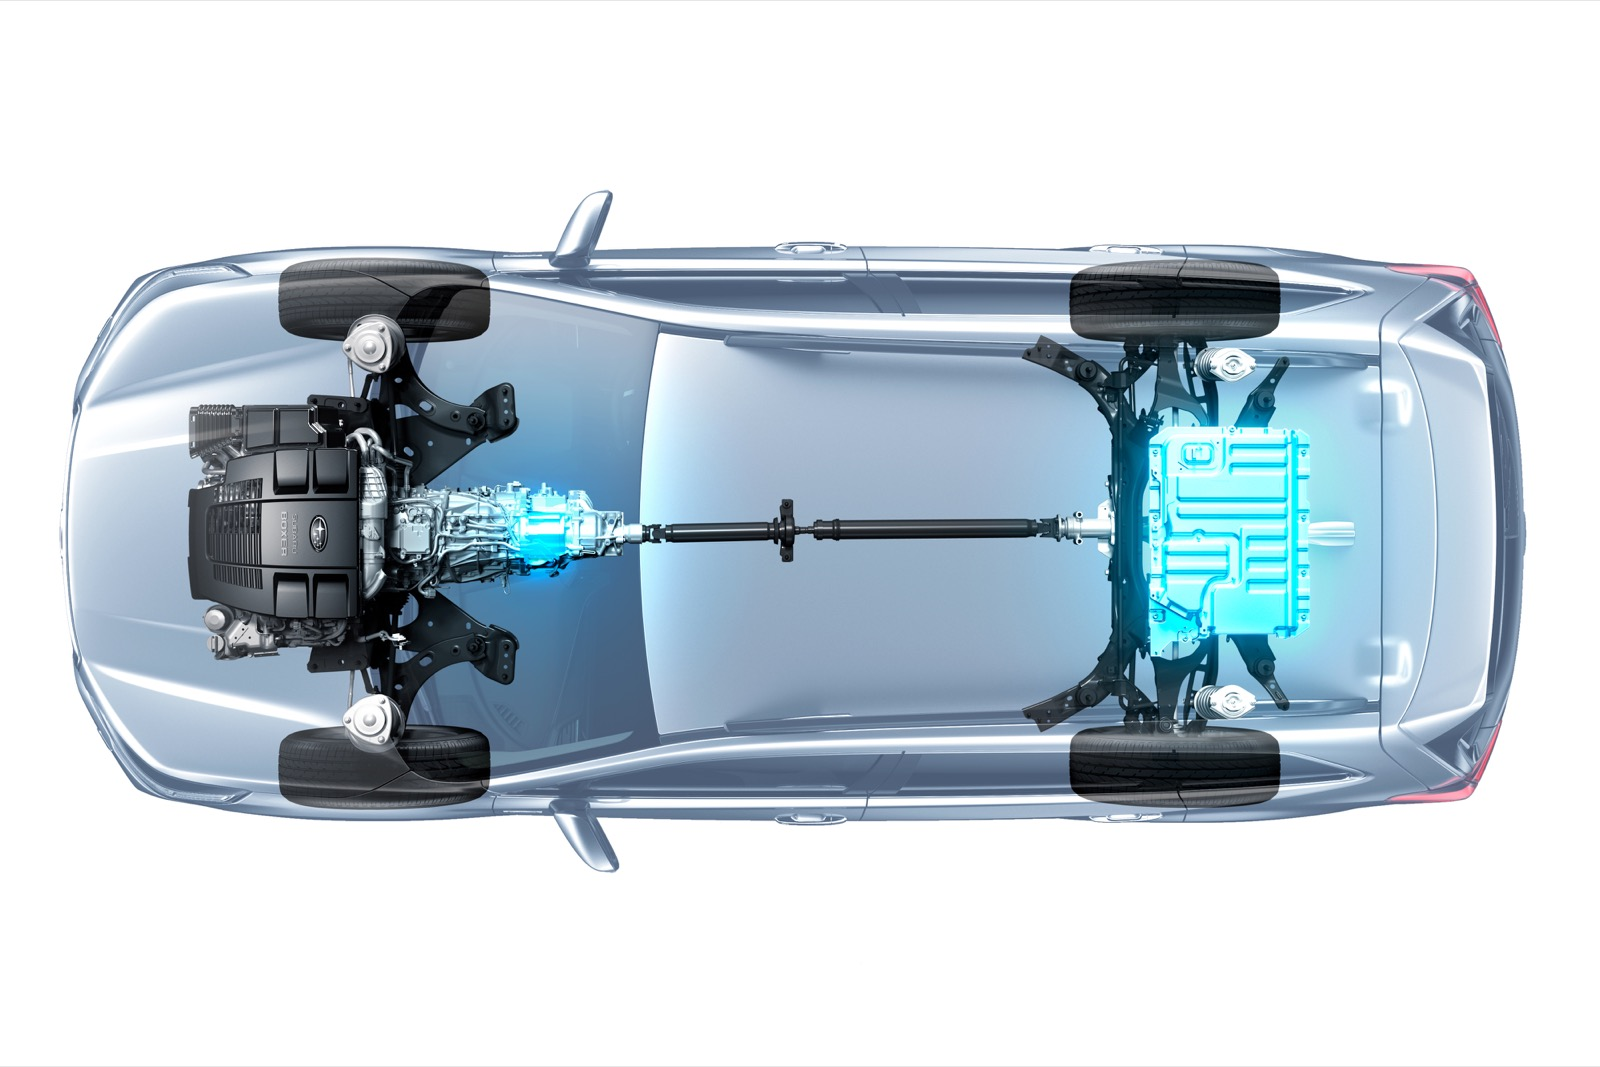 Plataforma Hibrida Subaru (1)